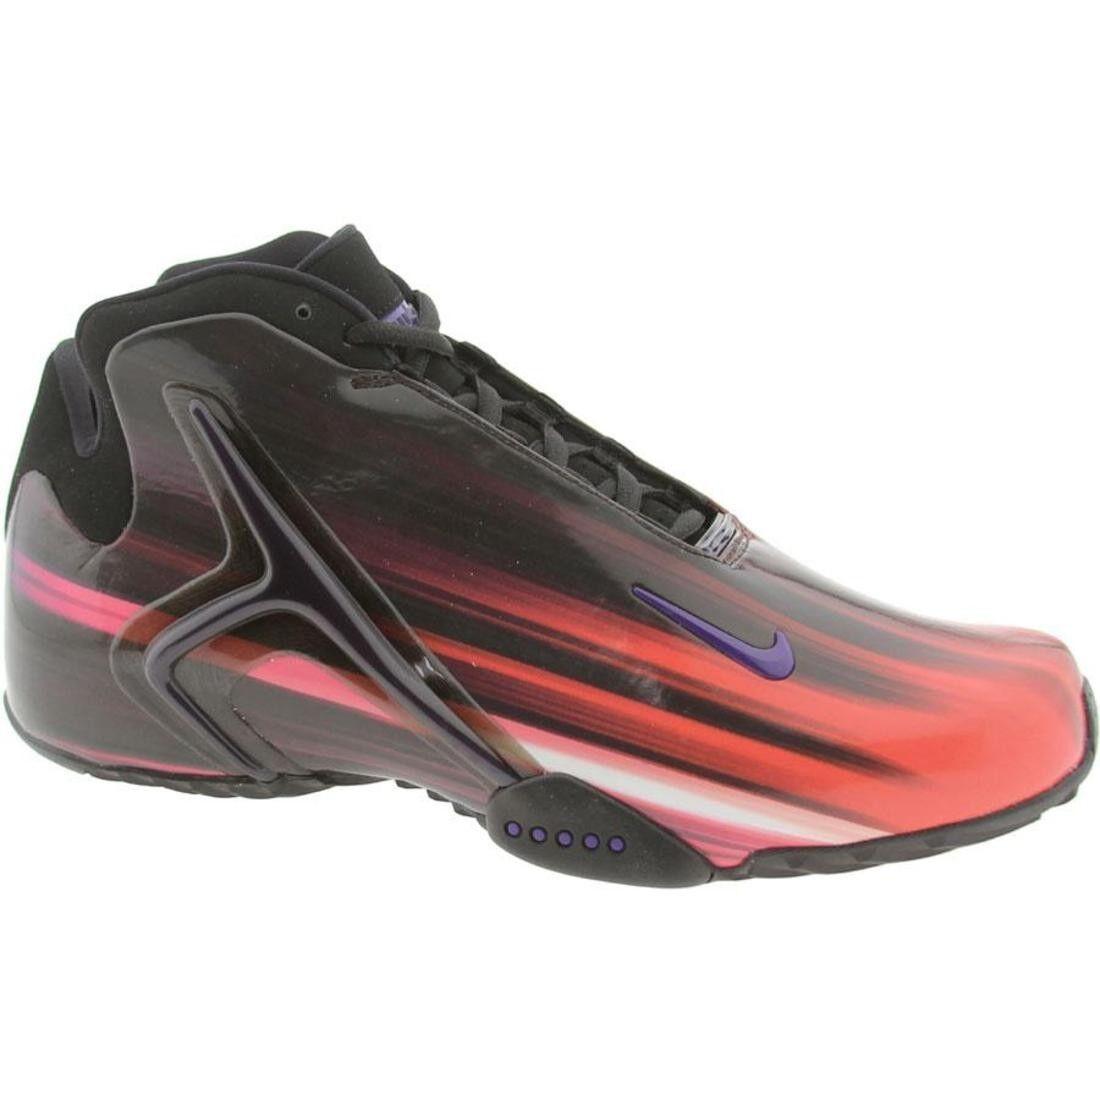 587561-800 Nike Men Zoom Hyperflight red PRM LBJ Superhero Pack red Hyperflight Lebron King Jame 171e05